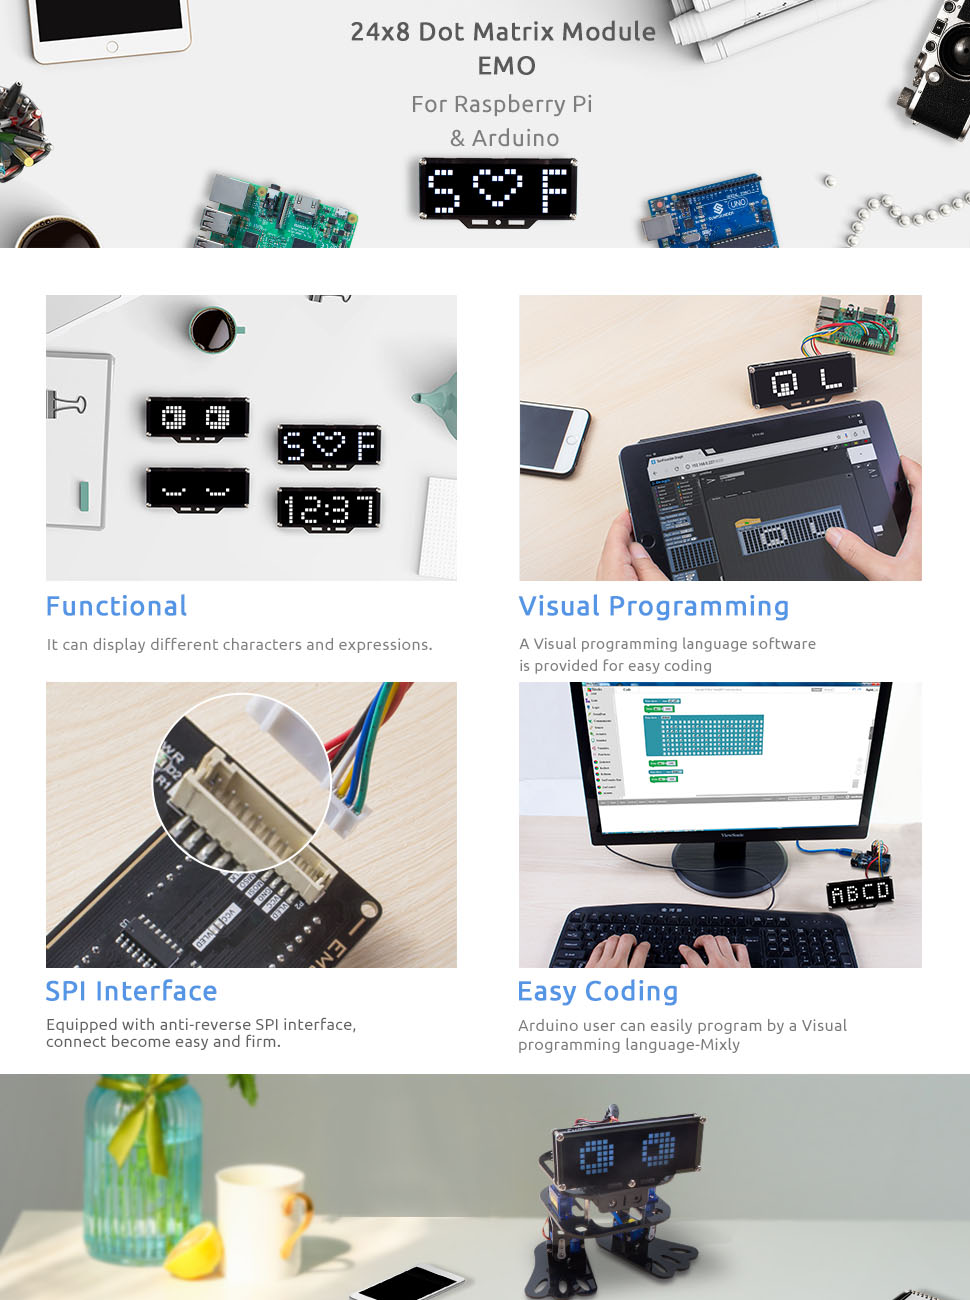 SunFounder Emo 24*8 LED Dot Matrix Display Module MCU Control DIY Kit for  Arduino and Raspberry Pi